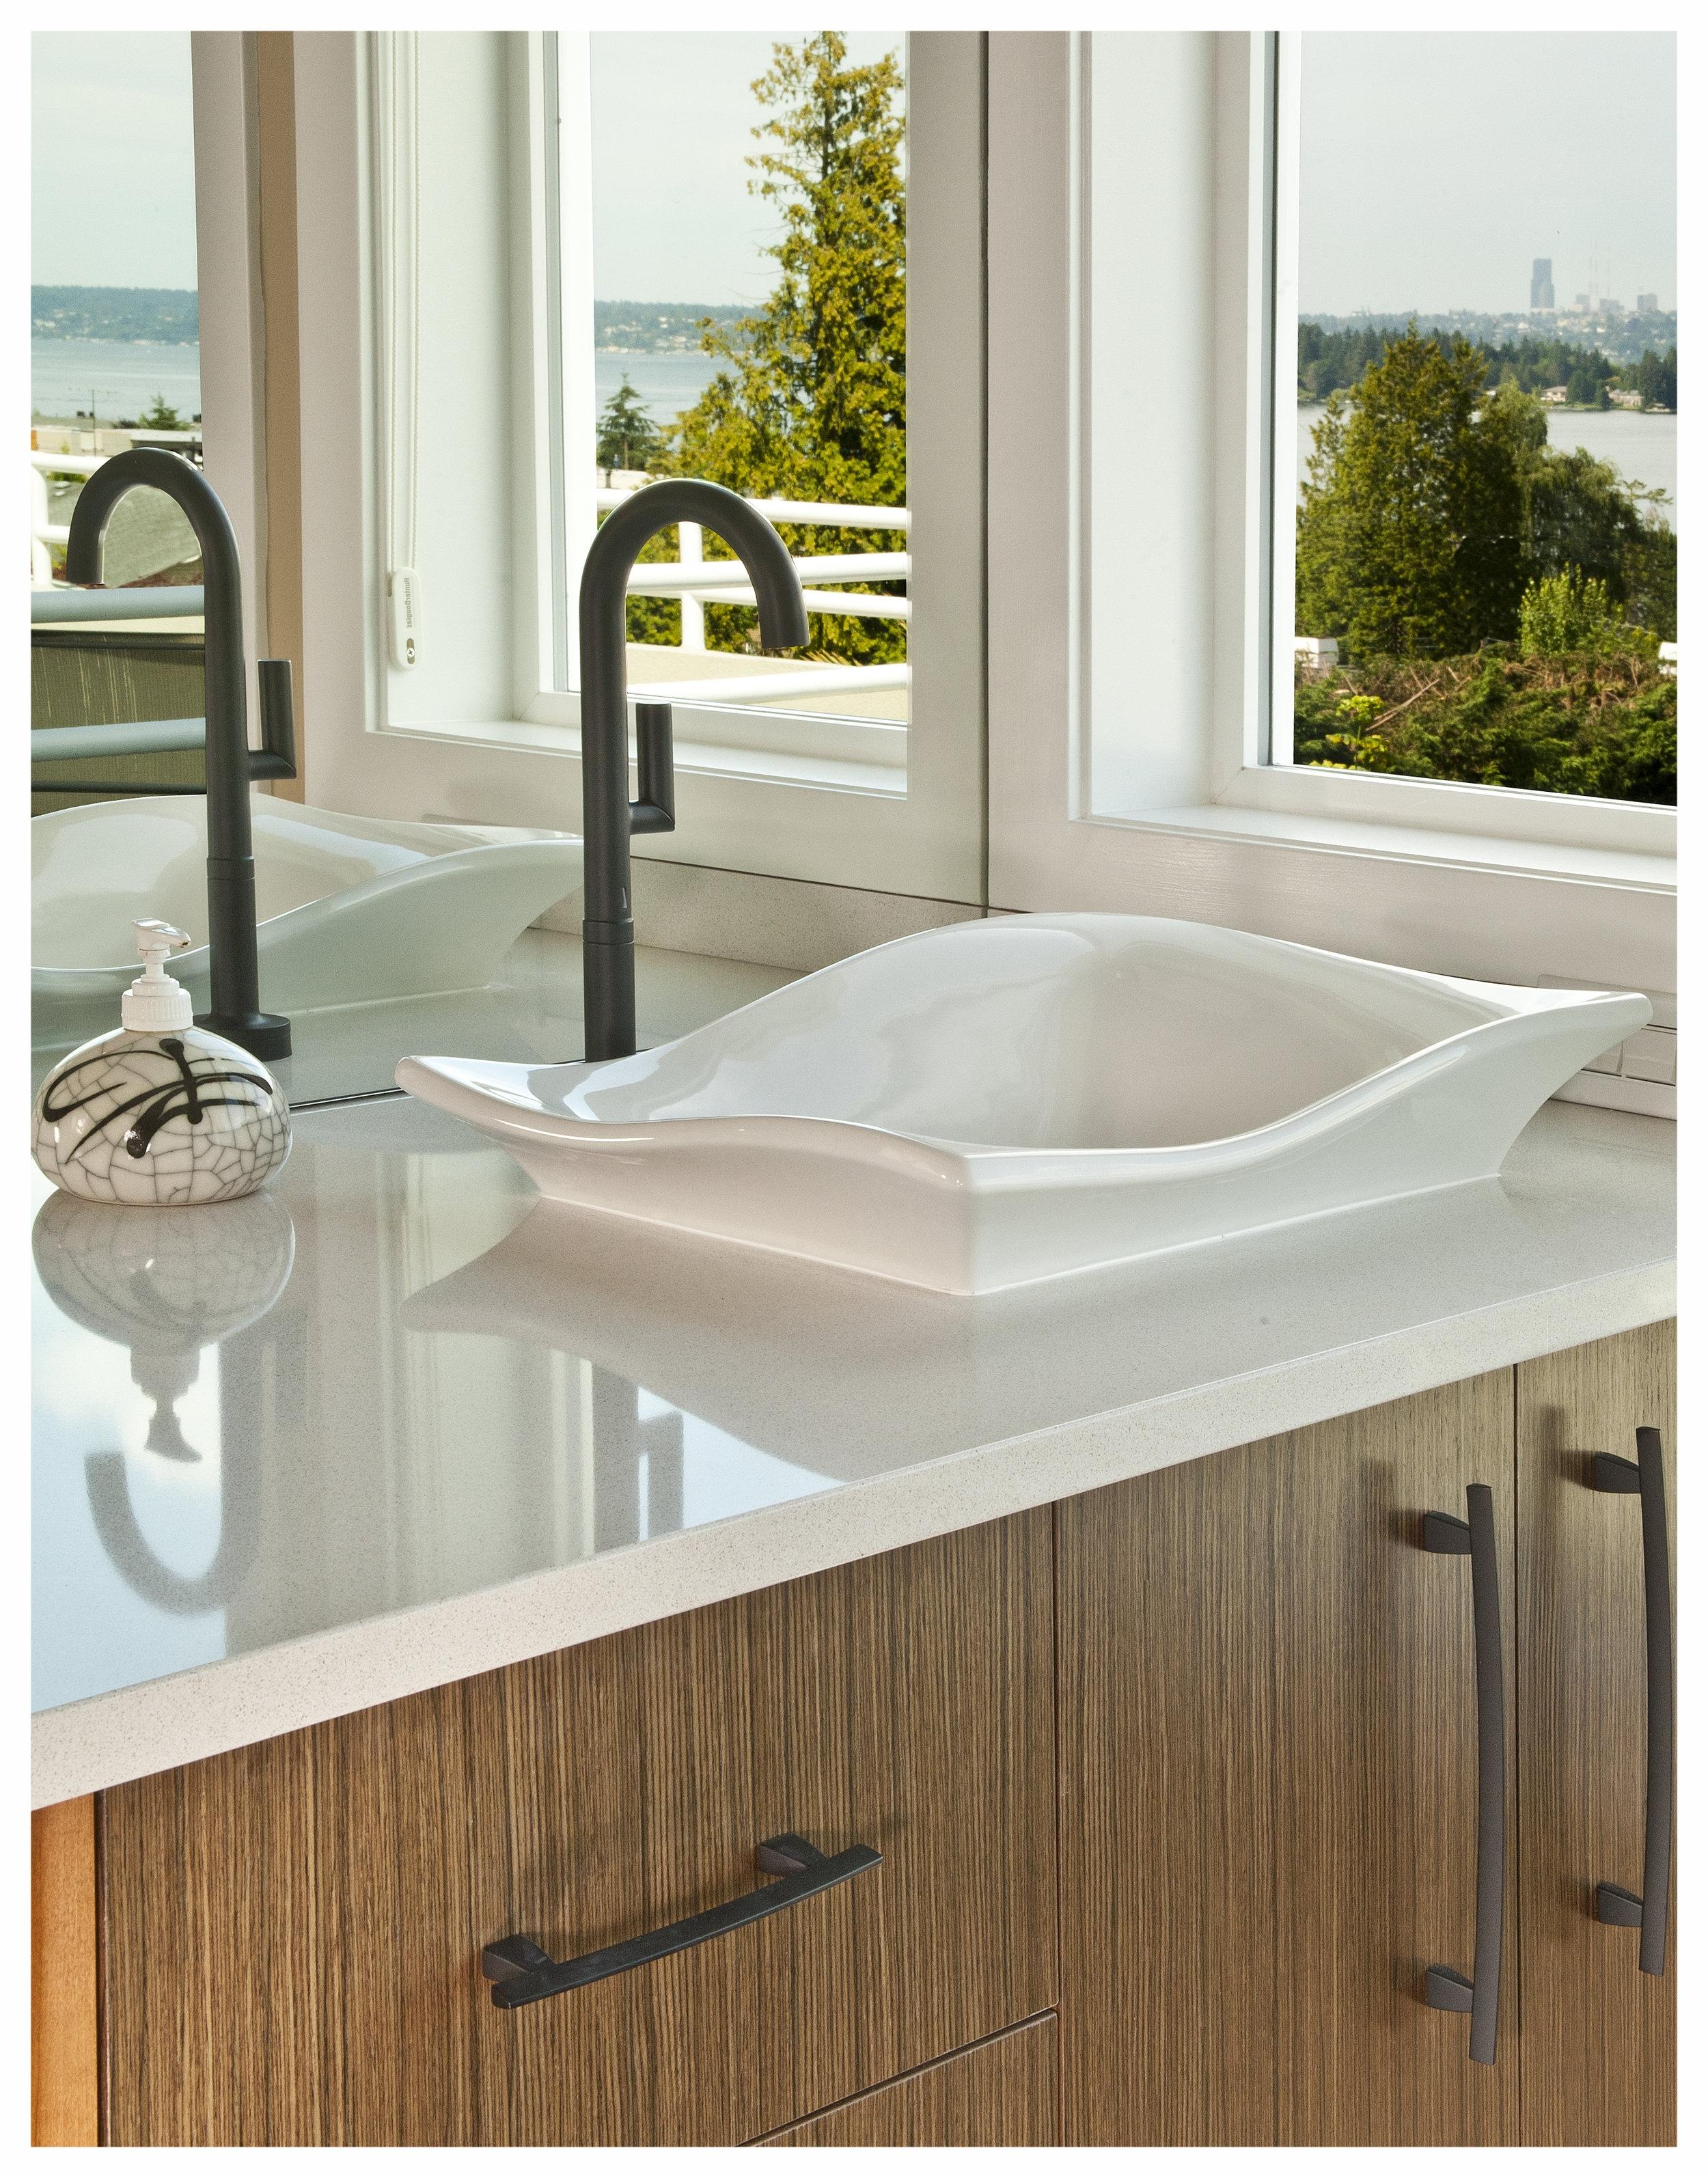 Kirkland Contemporary Master Bath 7 (2).jpg